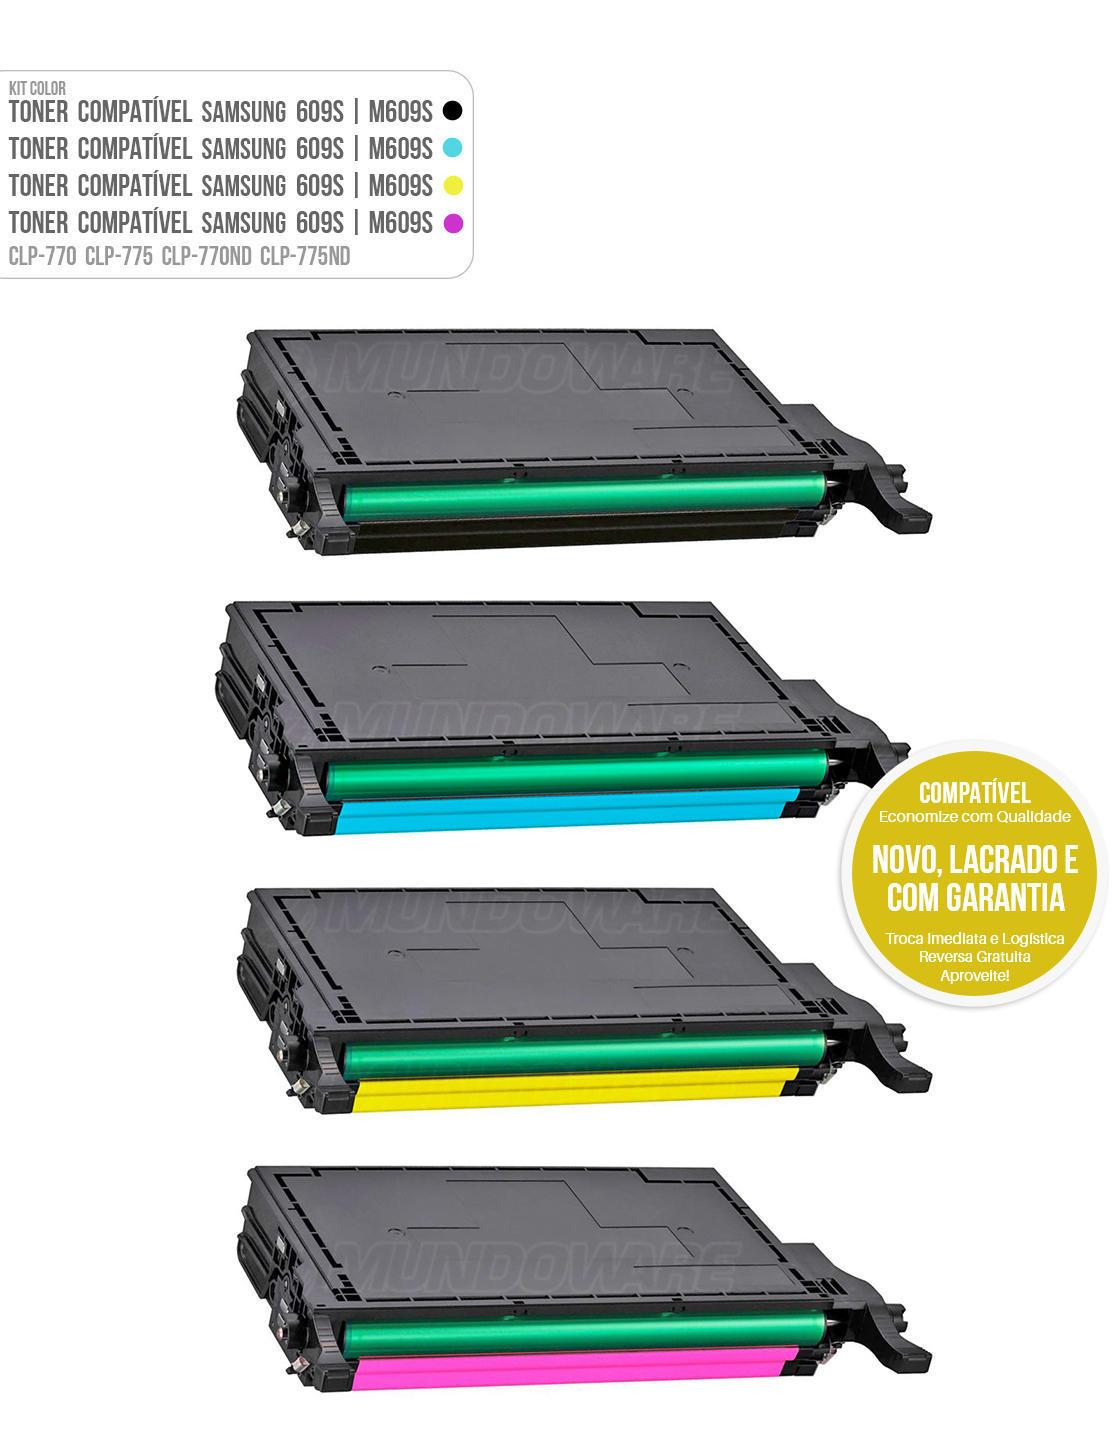 Kit 4 Cores de Toner Compatível com 609S para impressora Samsung CLP-770 CLP-775 CLP-770ND CLP-775ND CLP770 CLP775 CLP770ND CLP775ND